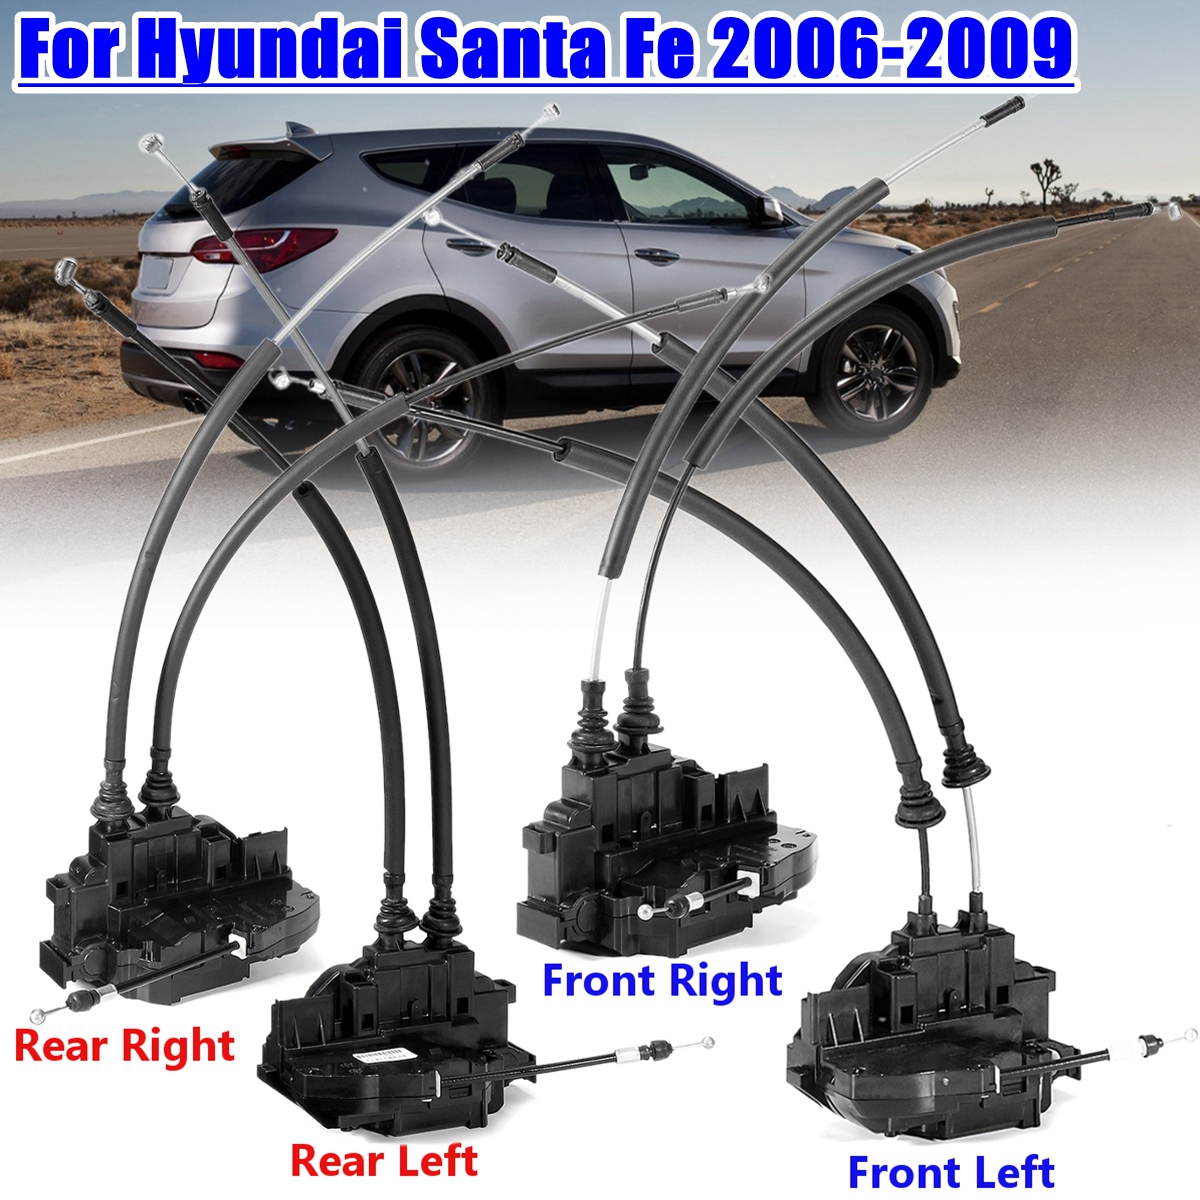 HVAC Heater Blend Door Actuator-Air Door Actuator fits 07-09 Hyundai Santa Fe